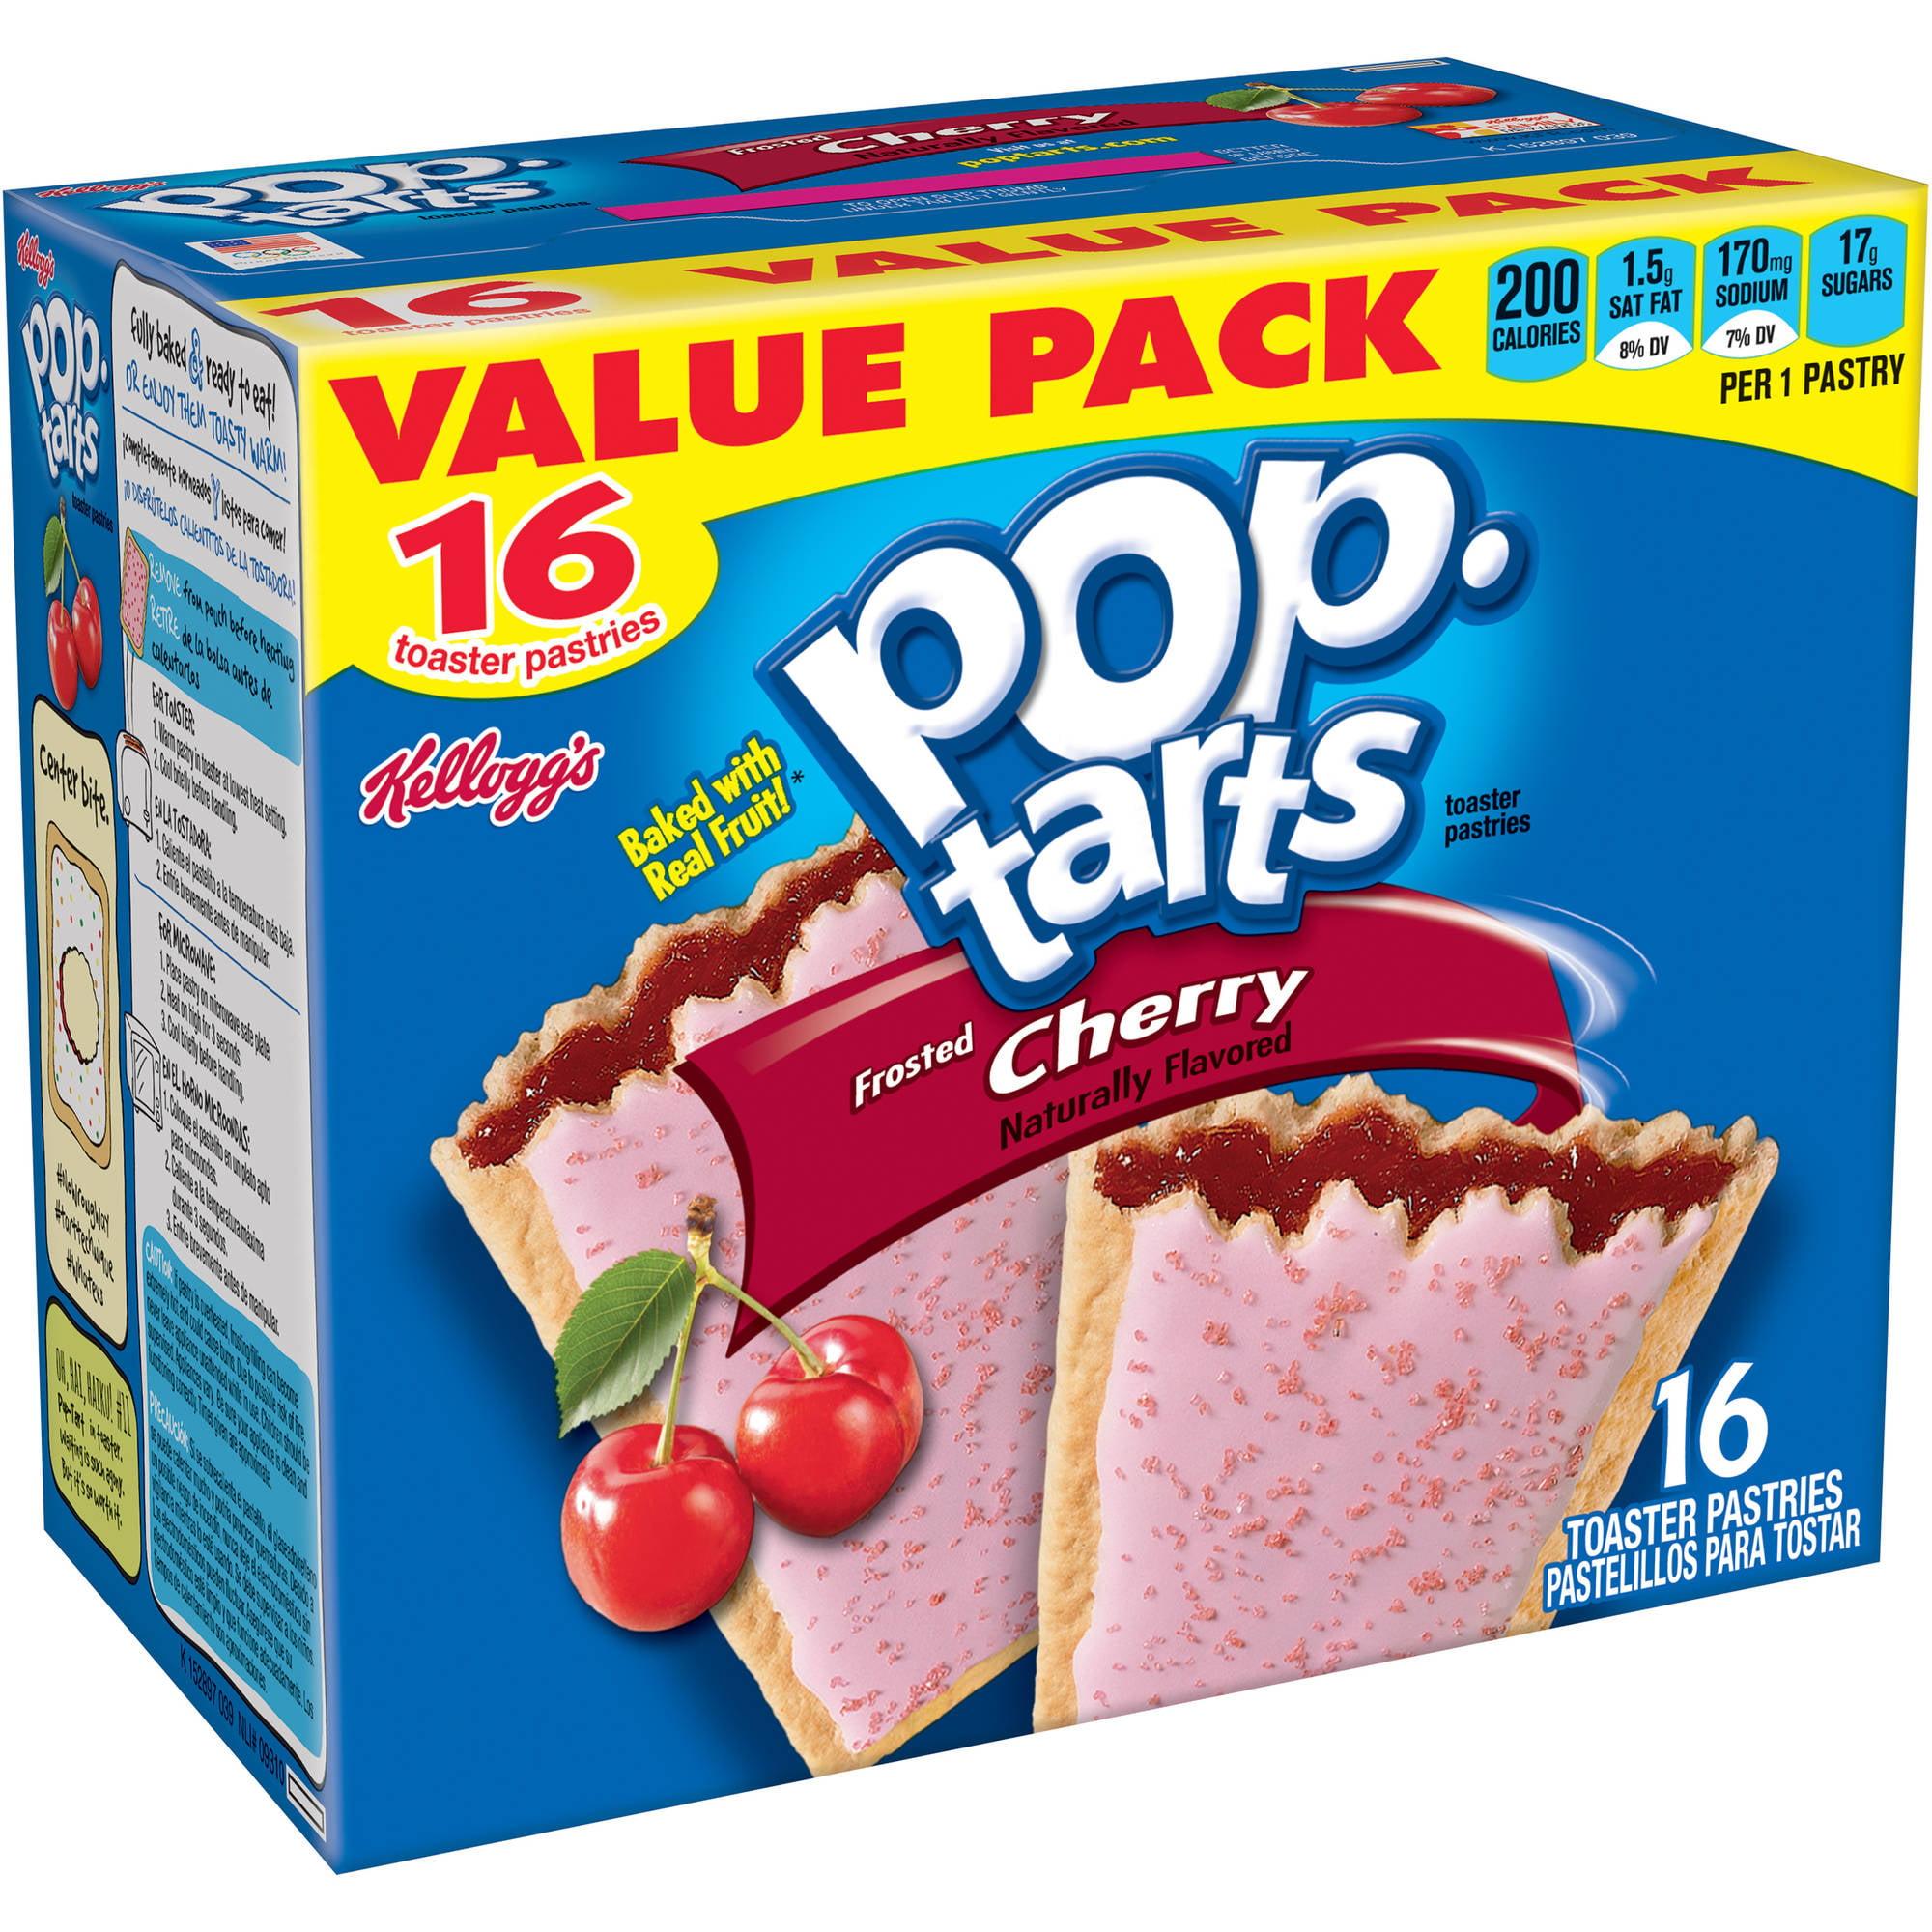 Kelloggs Pop Tarts Mini Crisps Frosted Strawberry Tasty Baked Bites 049 Oz 12 Count